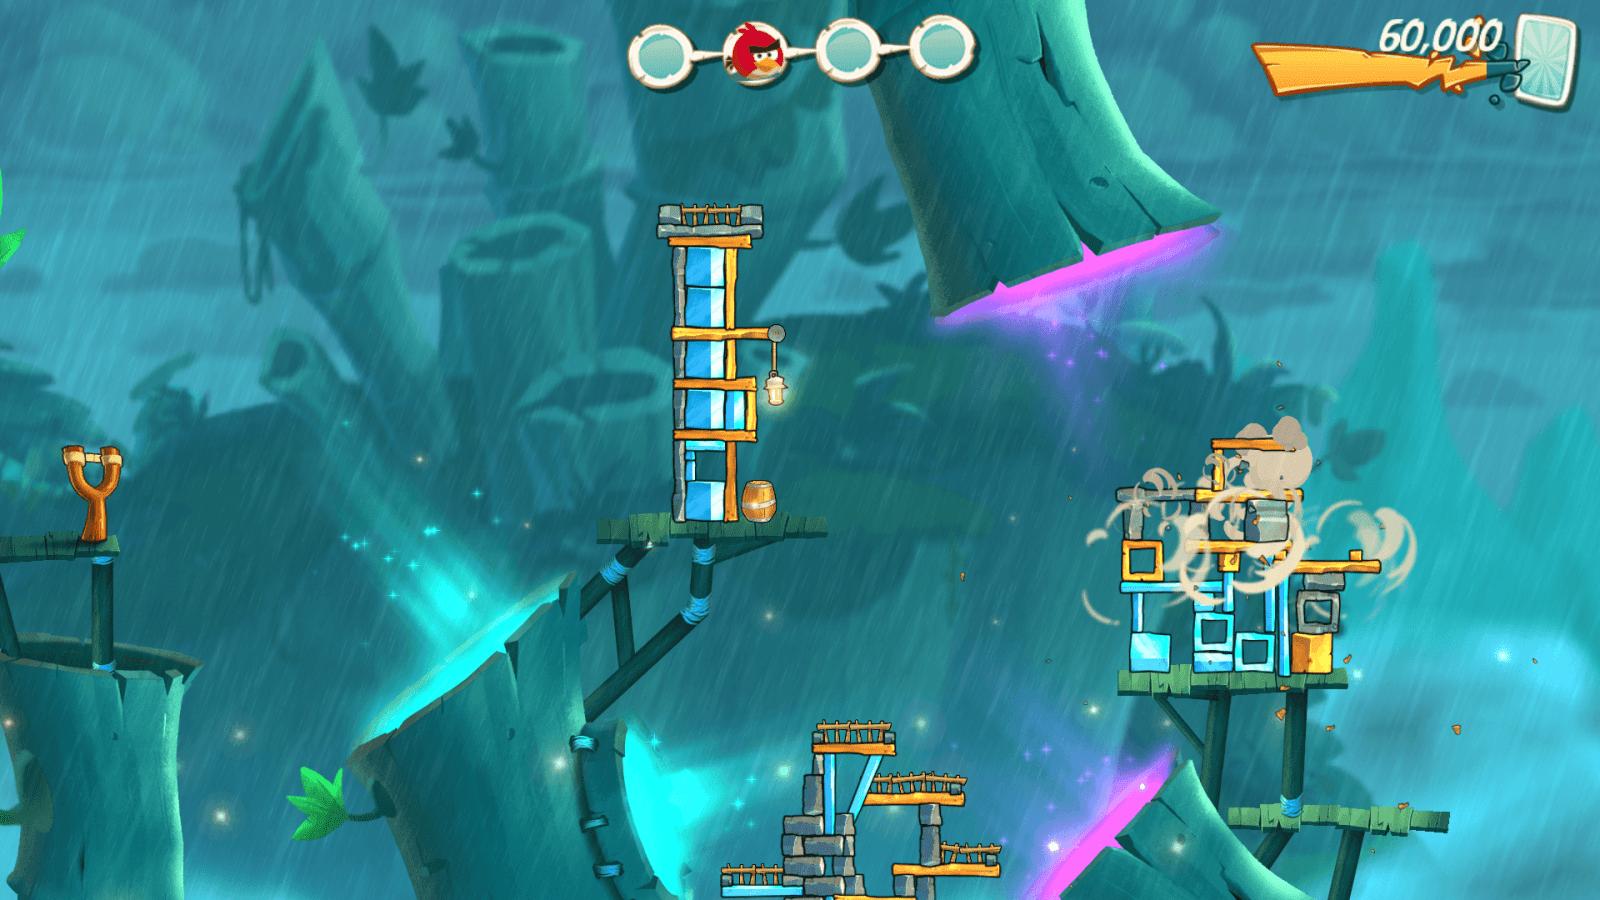 Screenshot 2015 08 19 23 38 03 - Обзор Angry Birds 2